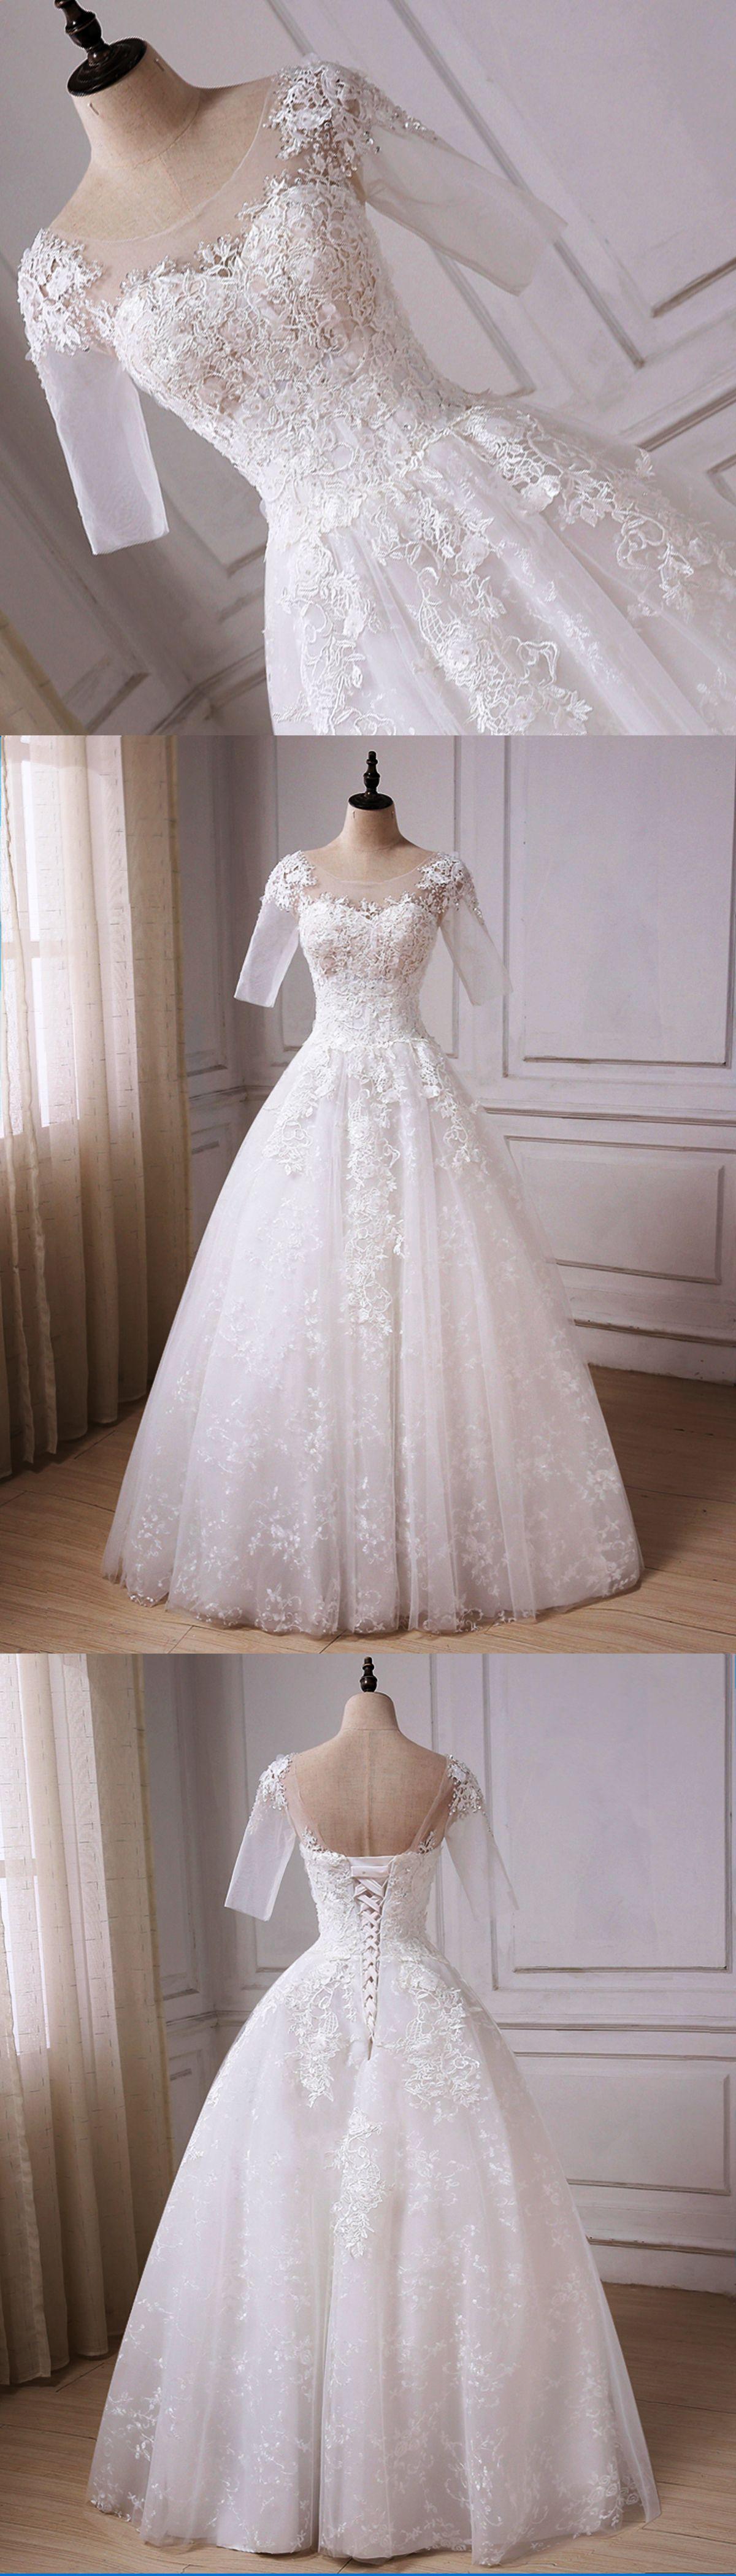 Elegant white tulle mid sleeve long lace aline wedding dress with